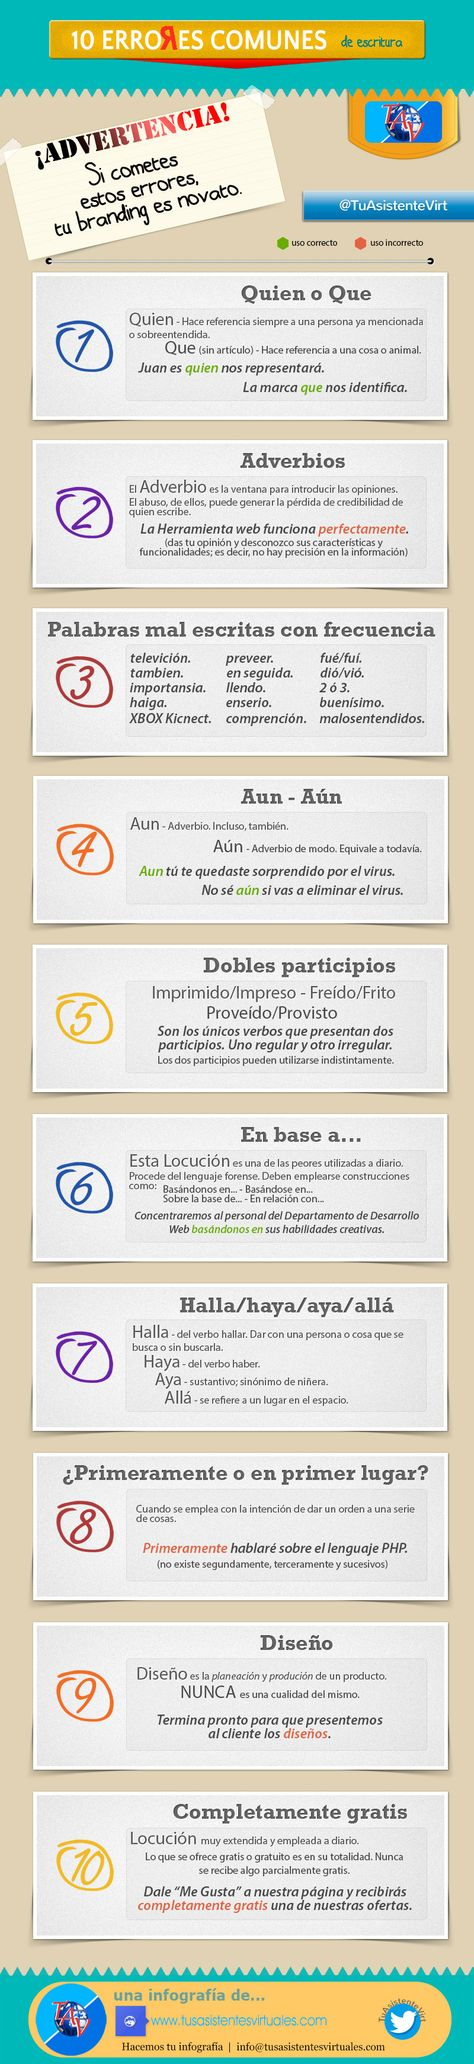 Learn Spanish, French, Italian, Portuguese, Latin, and German ...